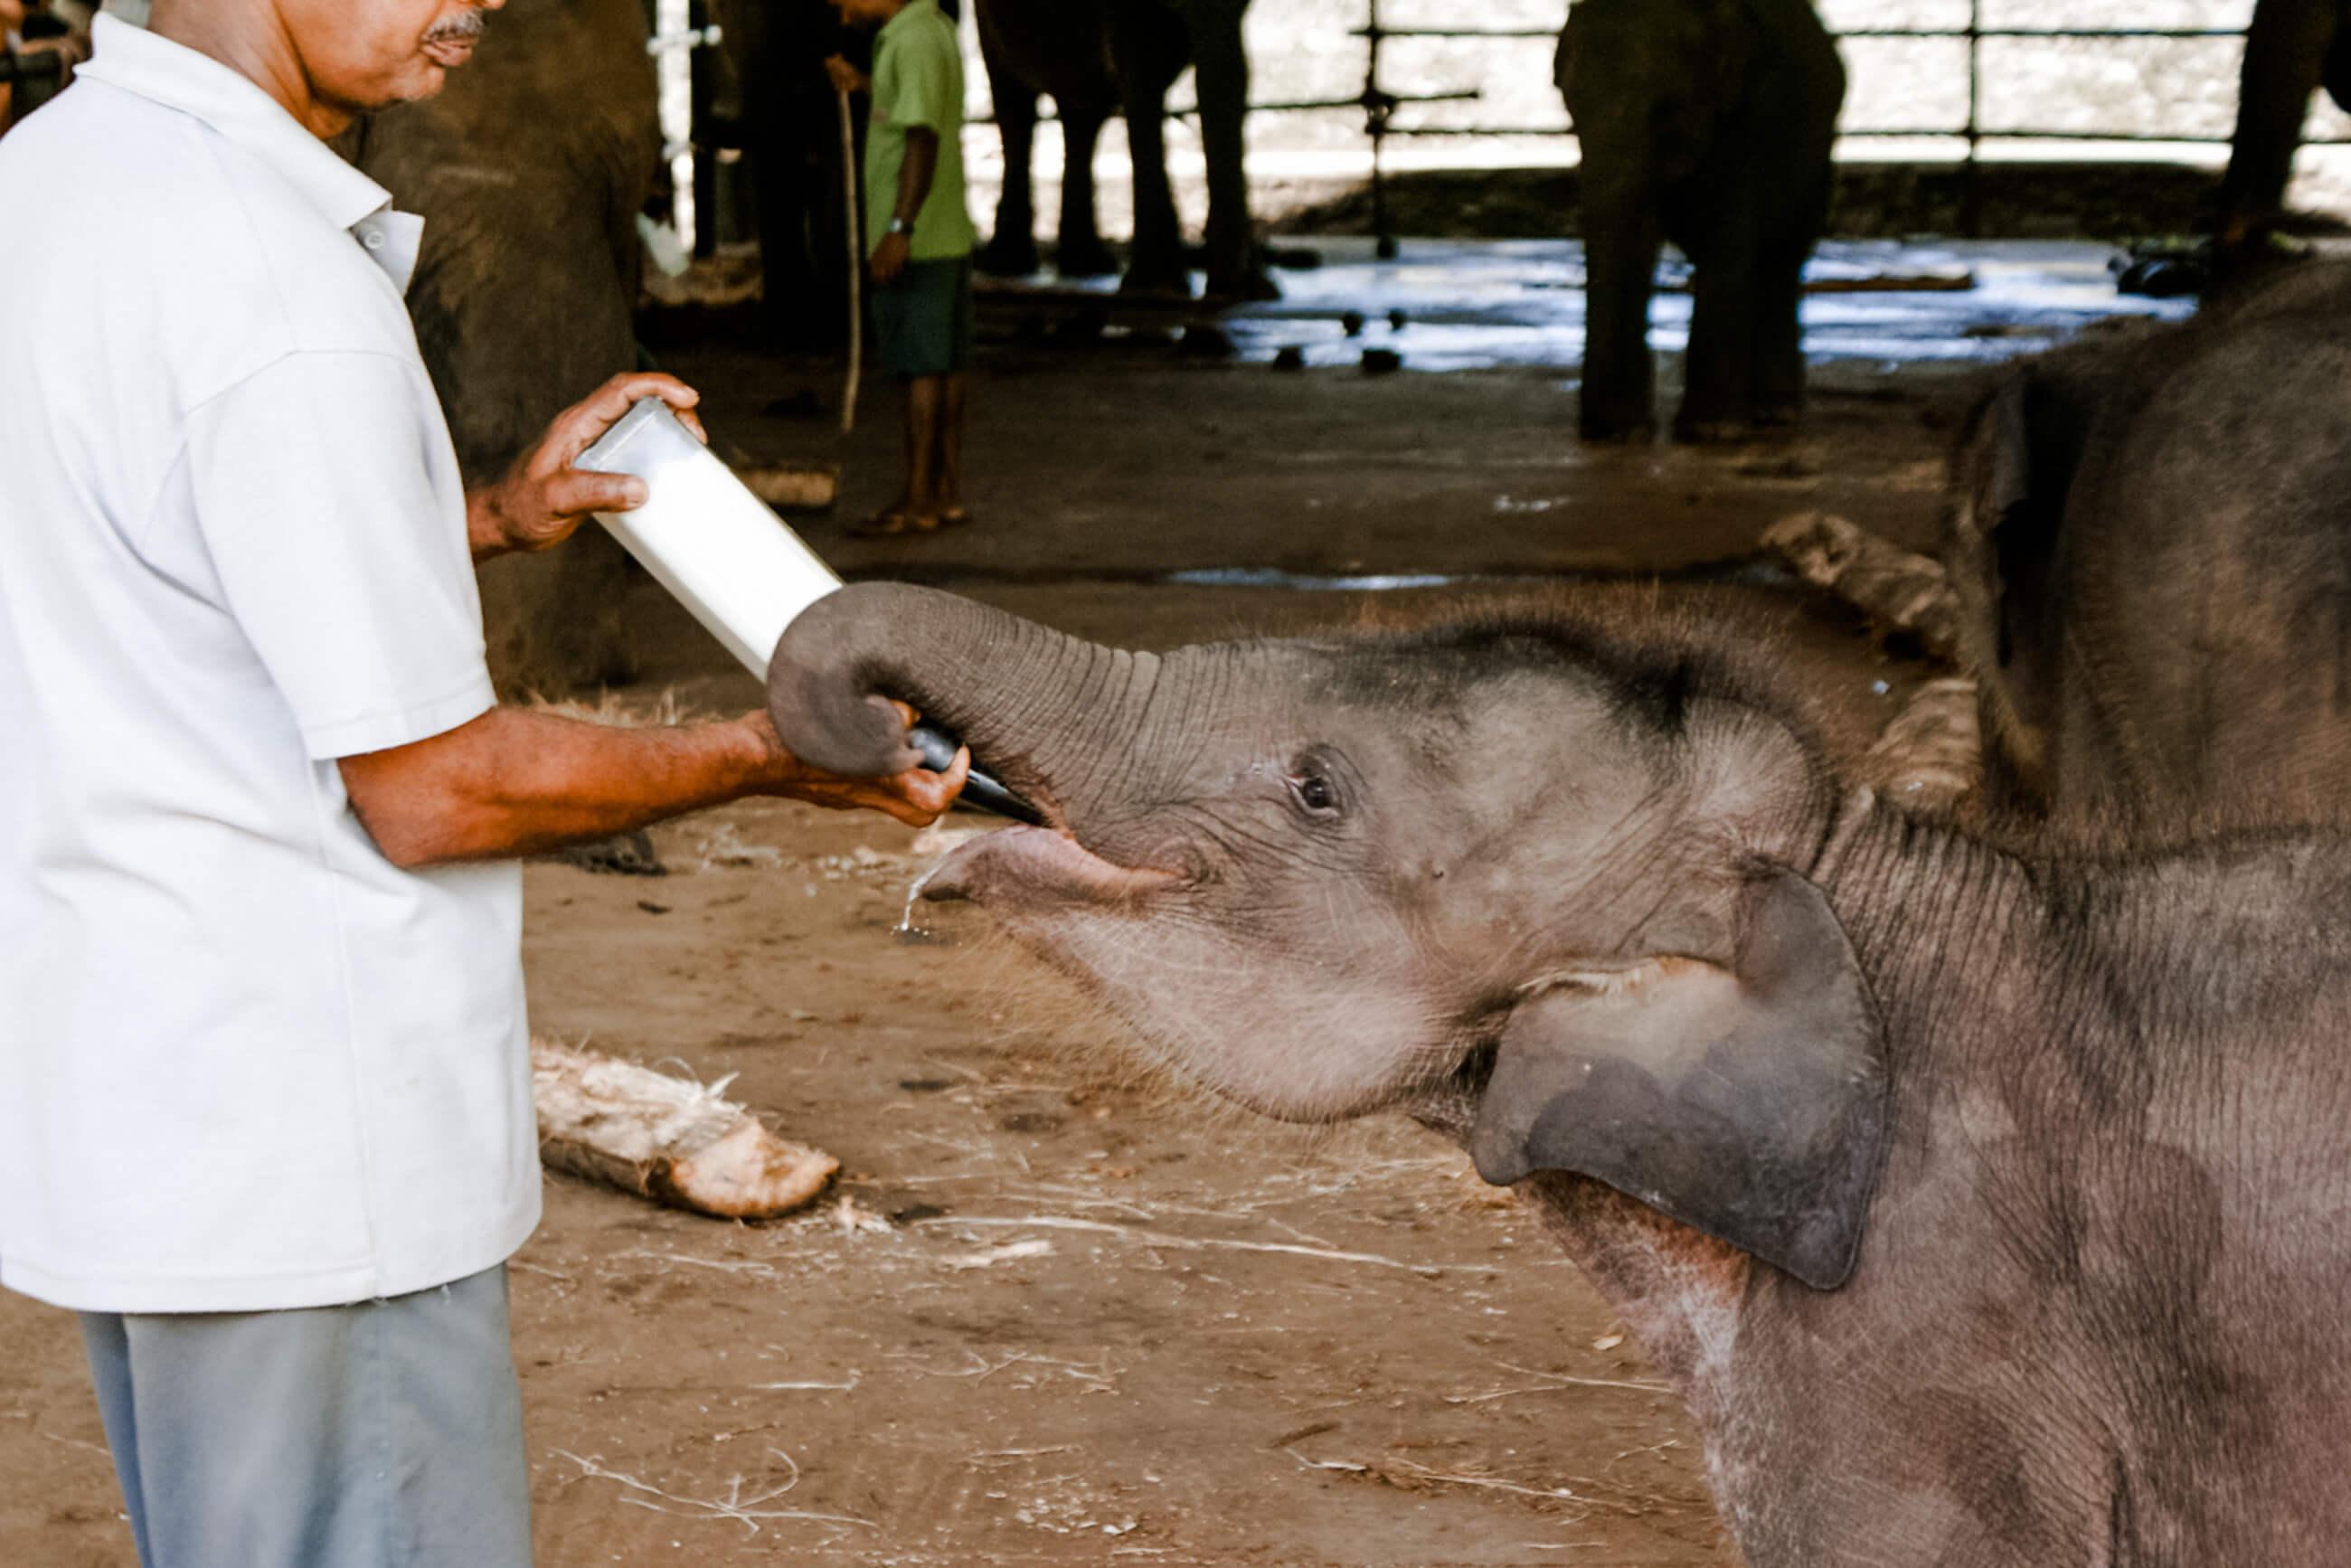 https://bubo.sk/uploads/galleries/7521/srilanka_family_7117_sri-lanka-fam-marec-2009-693.jpg